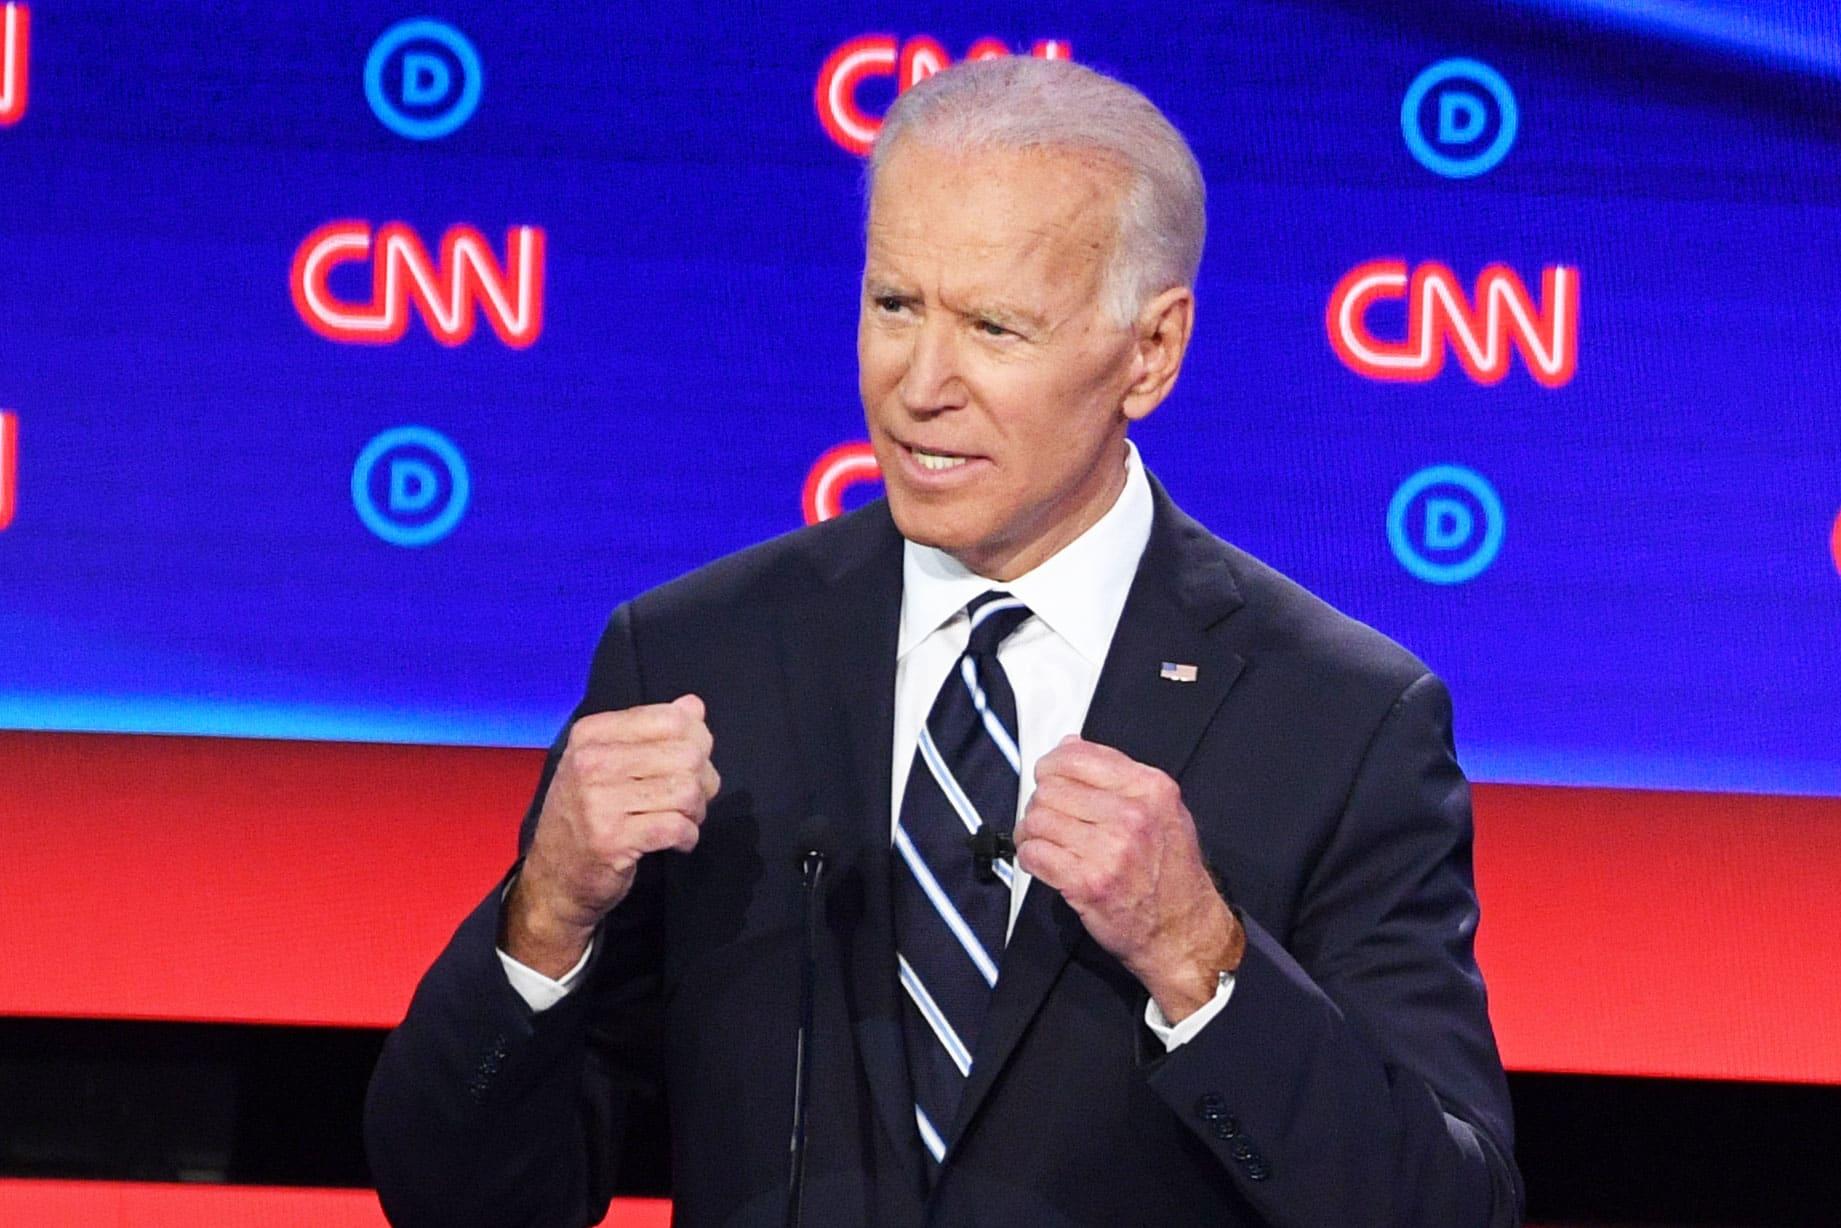 Joe Biden's PAC, American Possibilities, to shut down